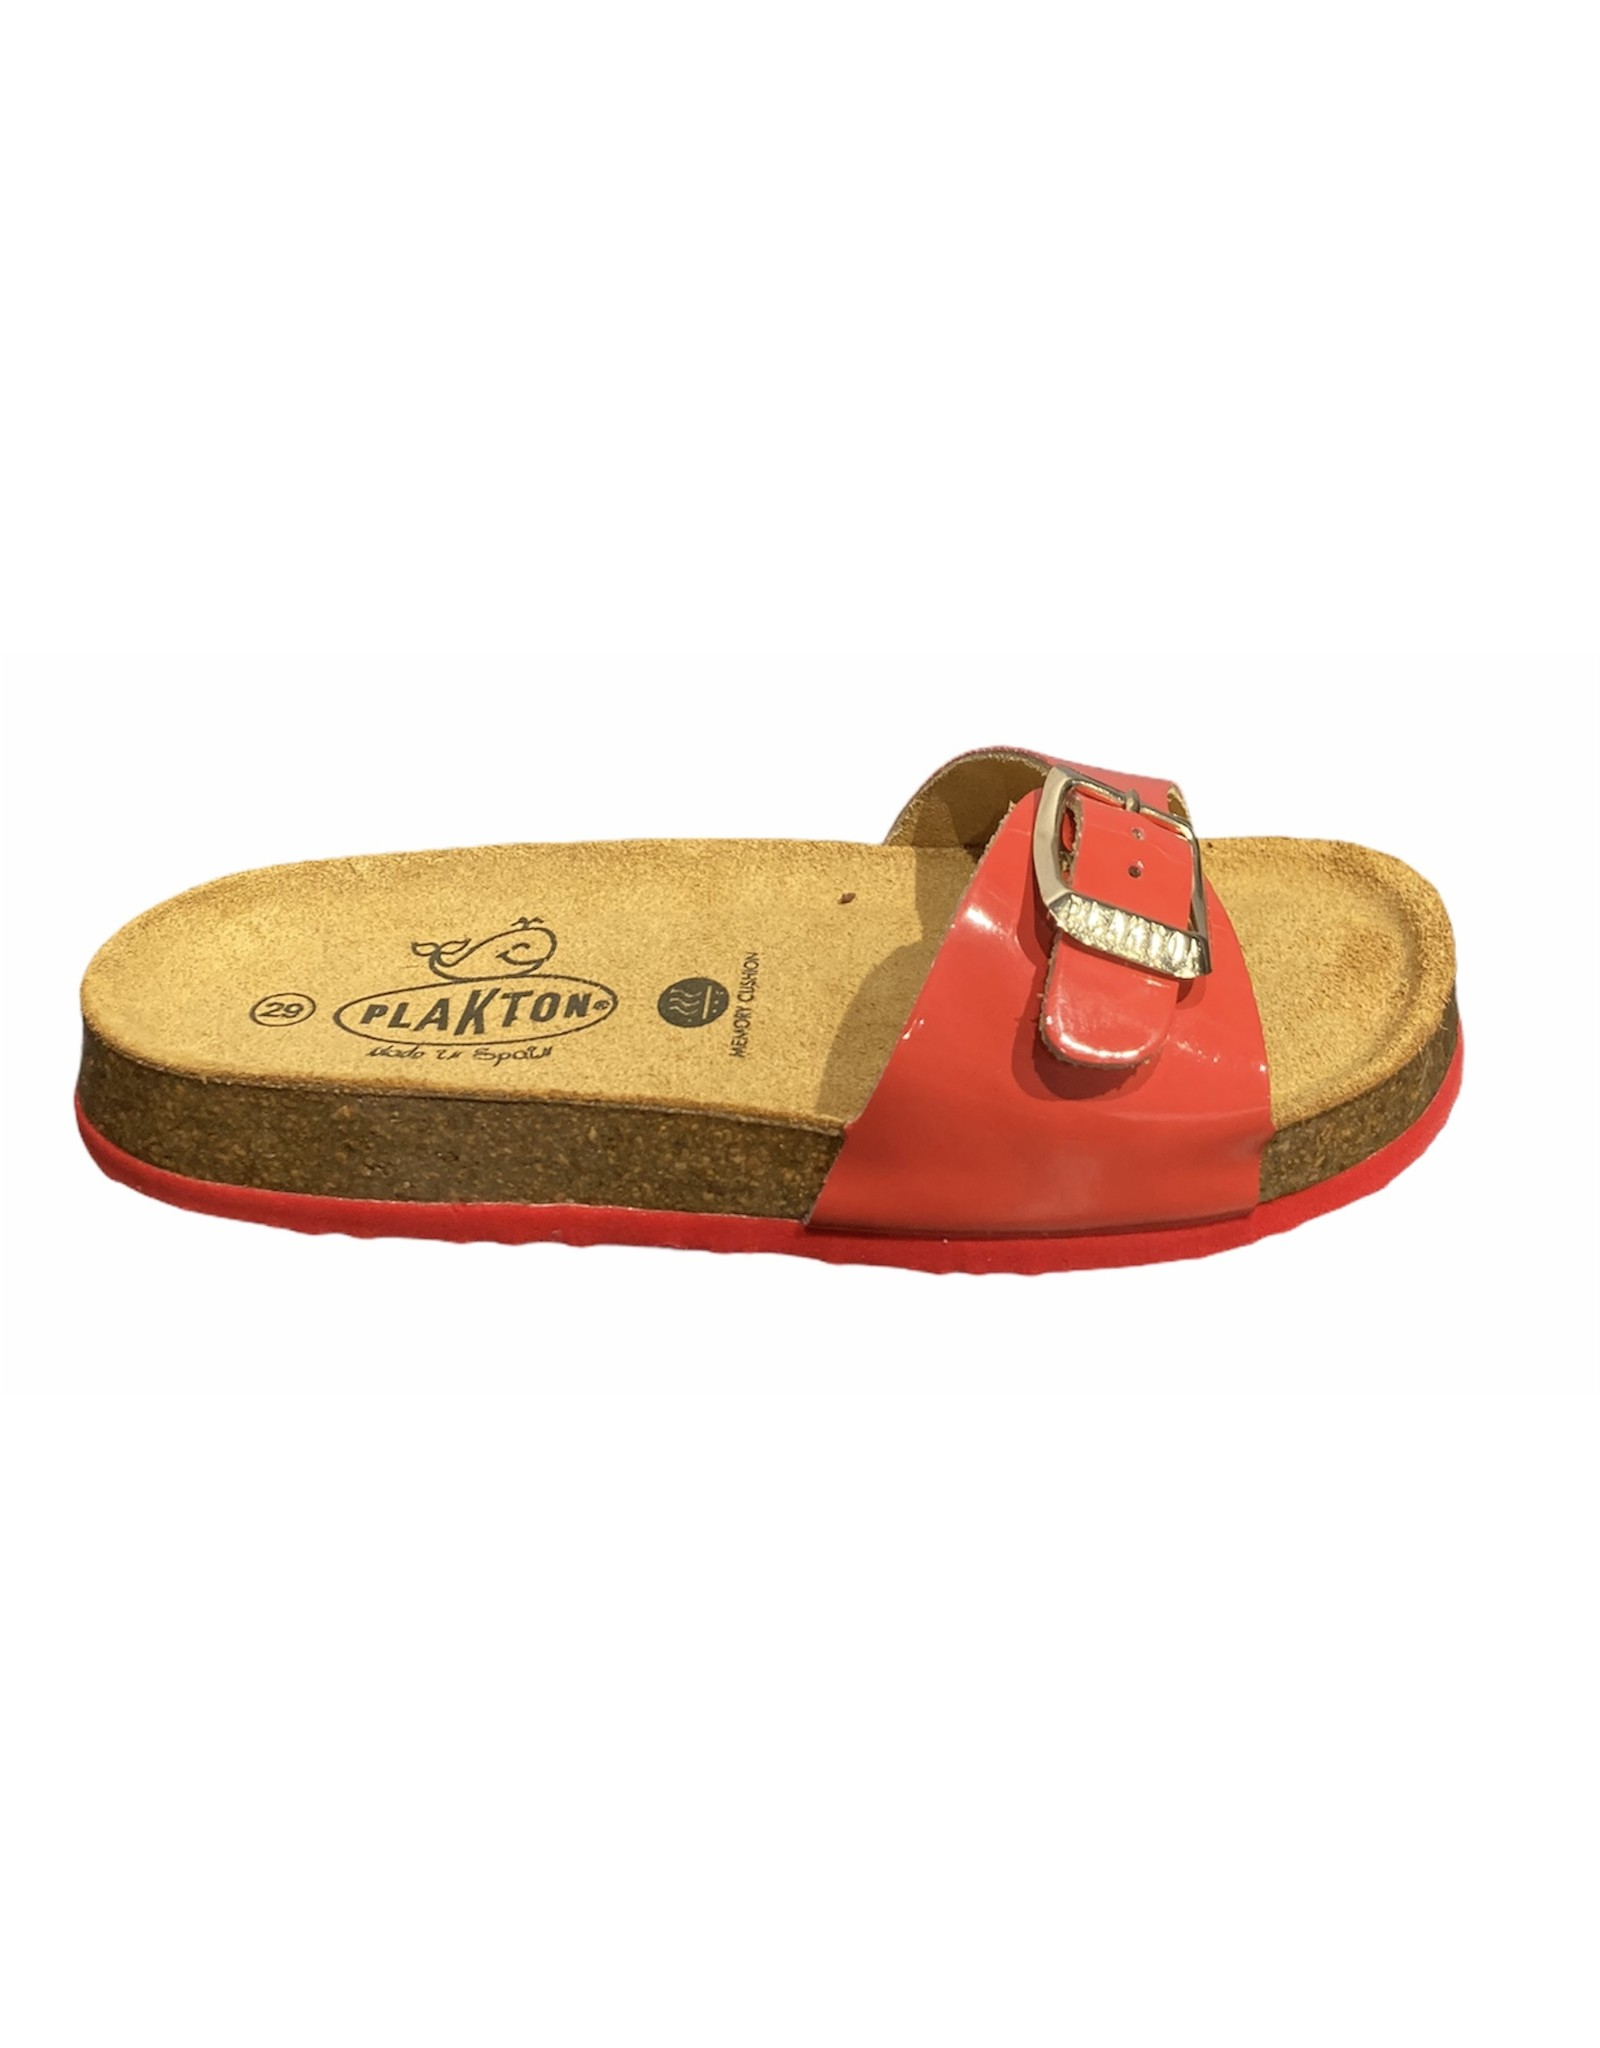 Plakton Plakton SS21 130001 slipper